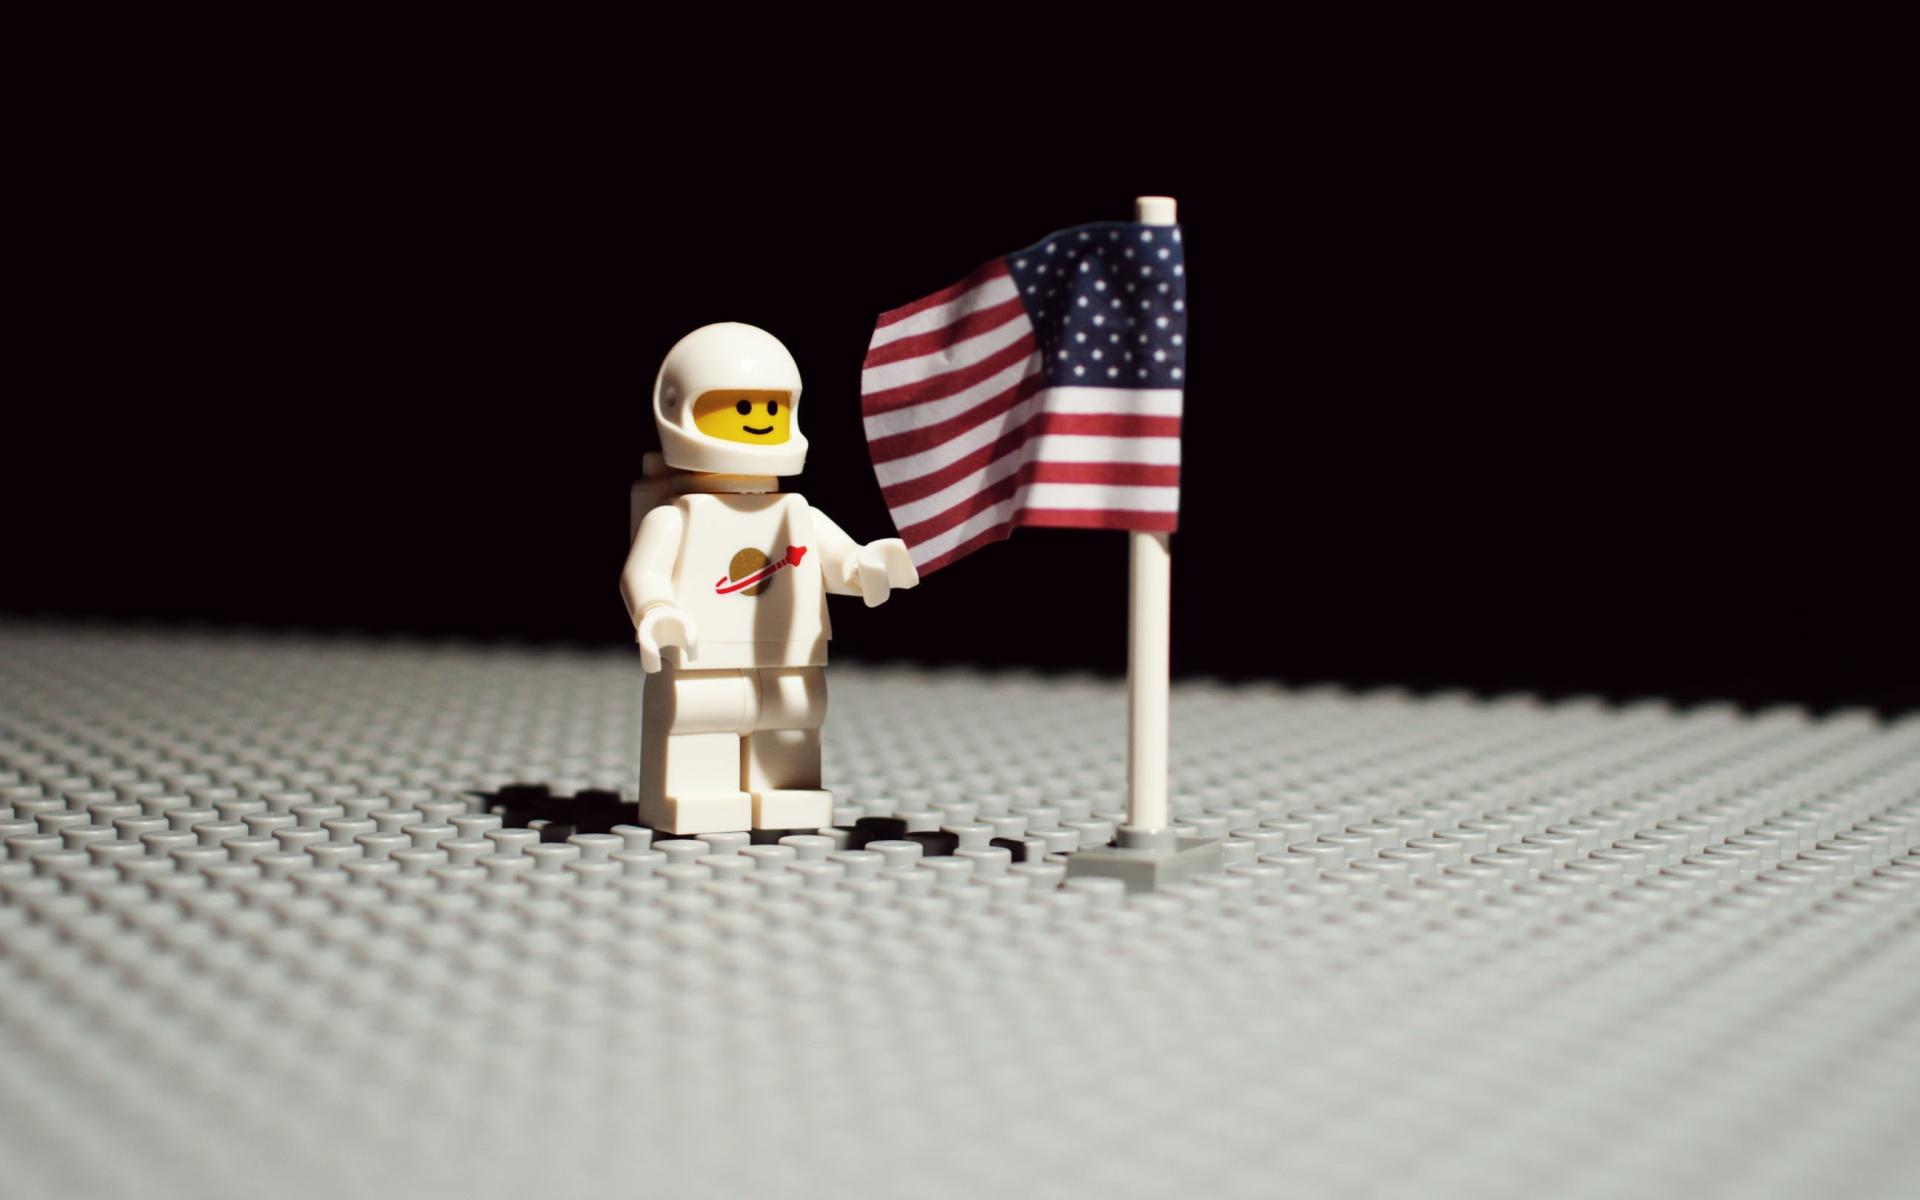 Lego Wallpaper 6530 1920x1200 px